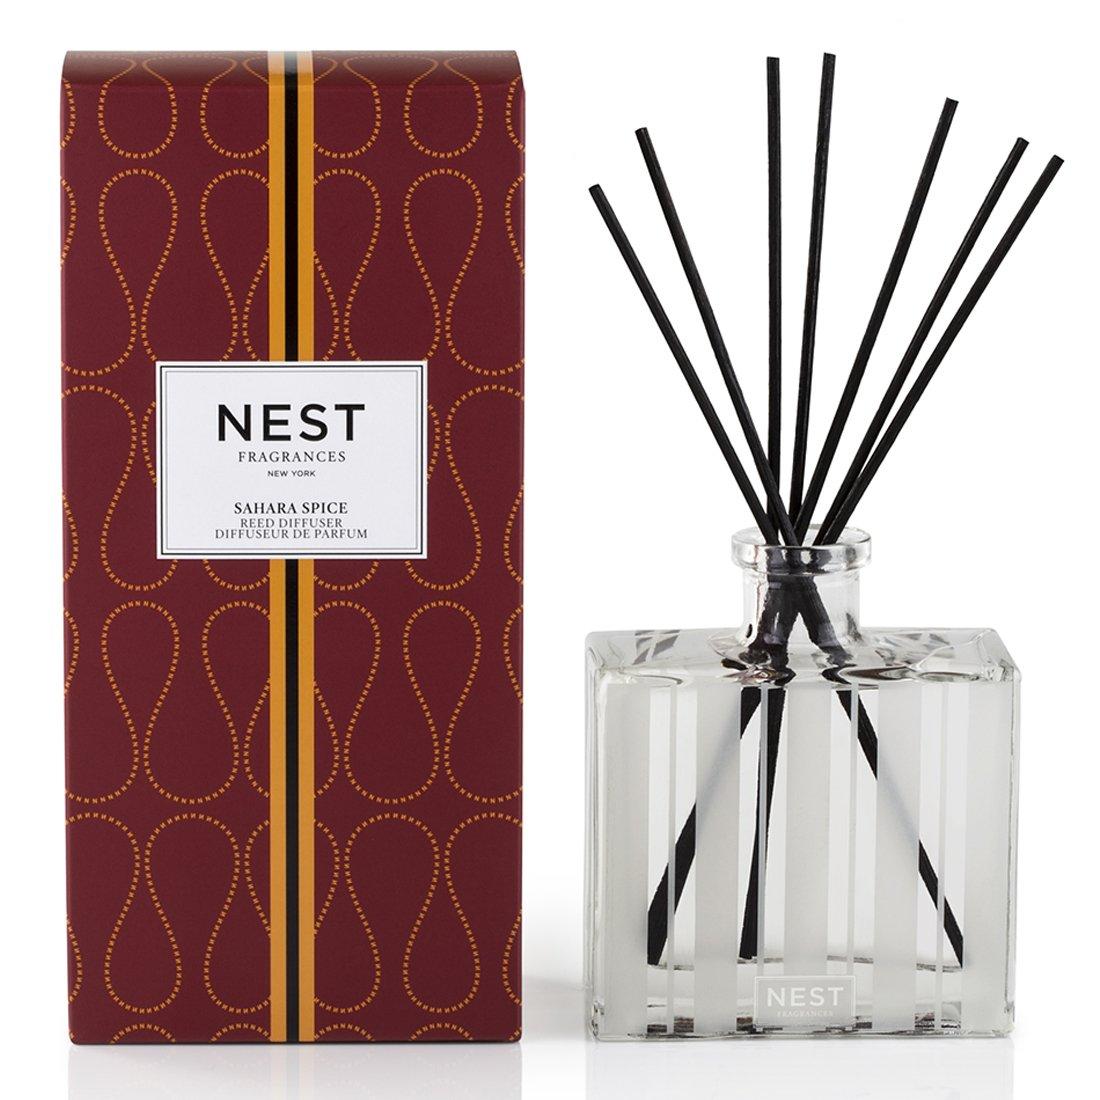 NEST Fragrances Reed Diffuser- Sahara Spice , 5.9 fl oz by NEST Fragrances (Image #1)